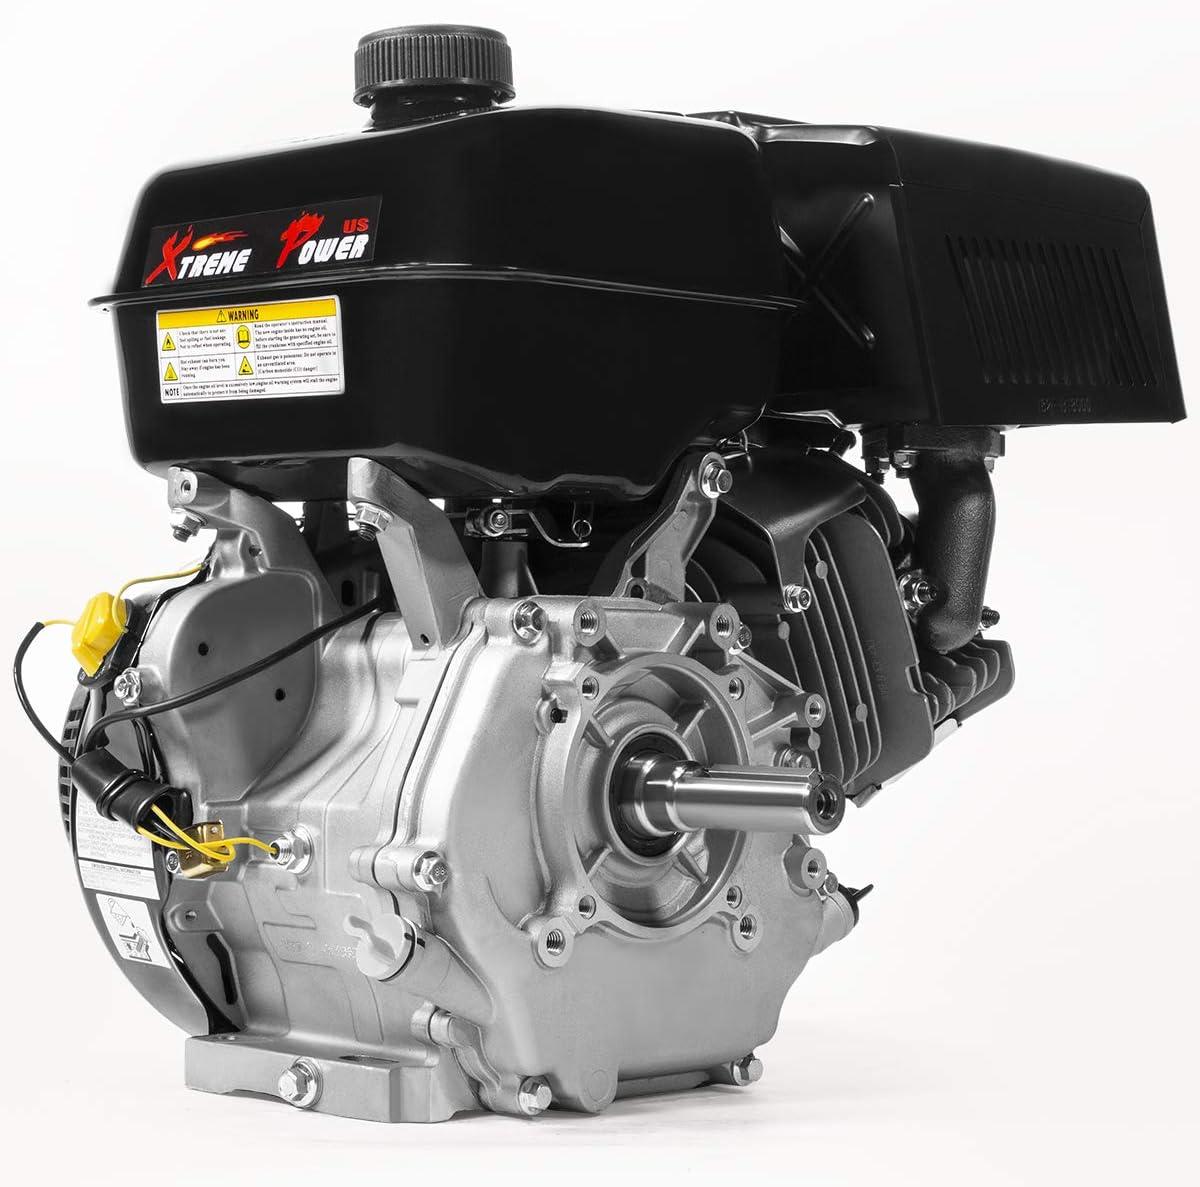 XtremepowerUS 62035 Industrial 驚きの値段 永遠の定番モデル 15HP OHV Gas 4-Stroke Horizontal